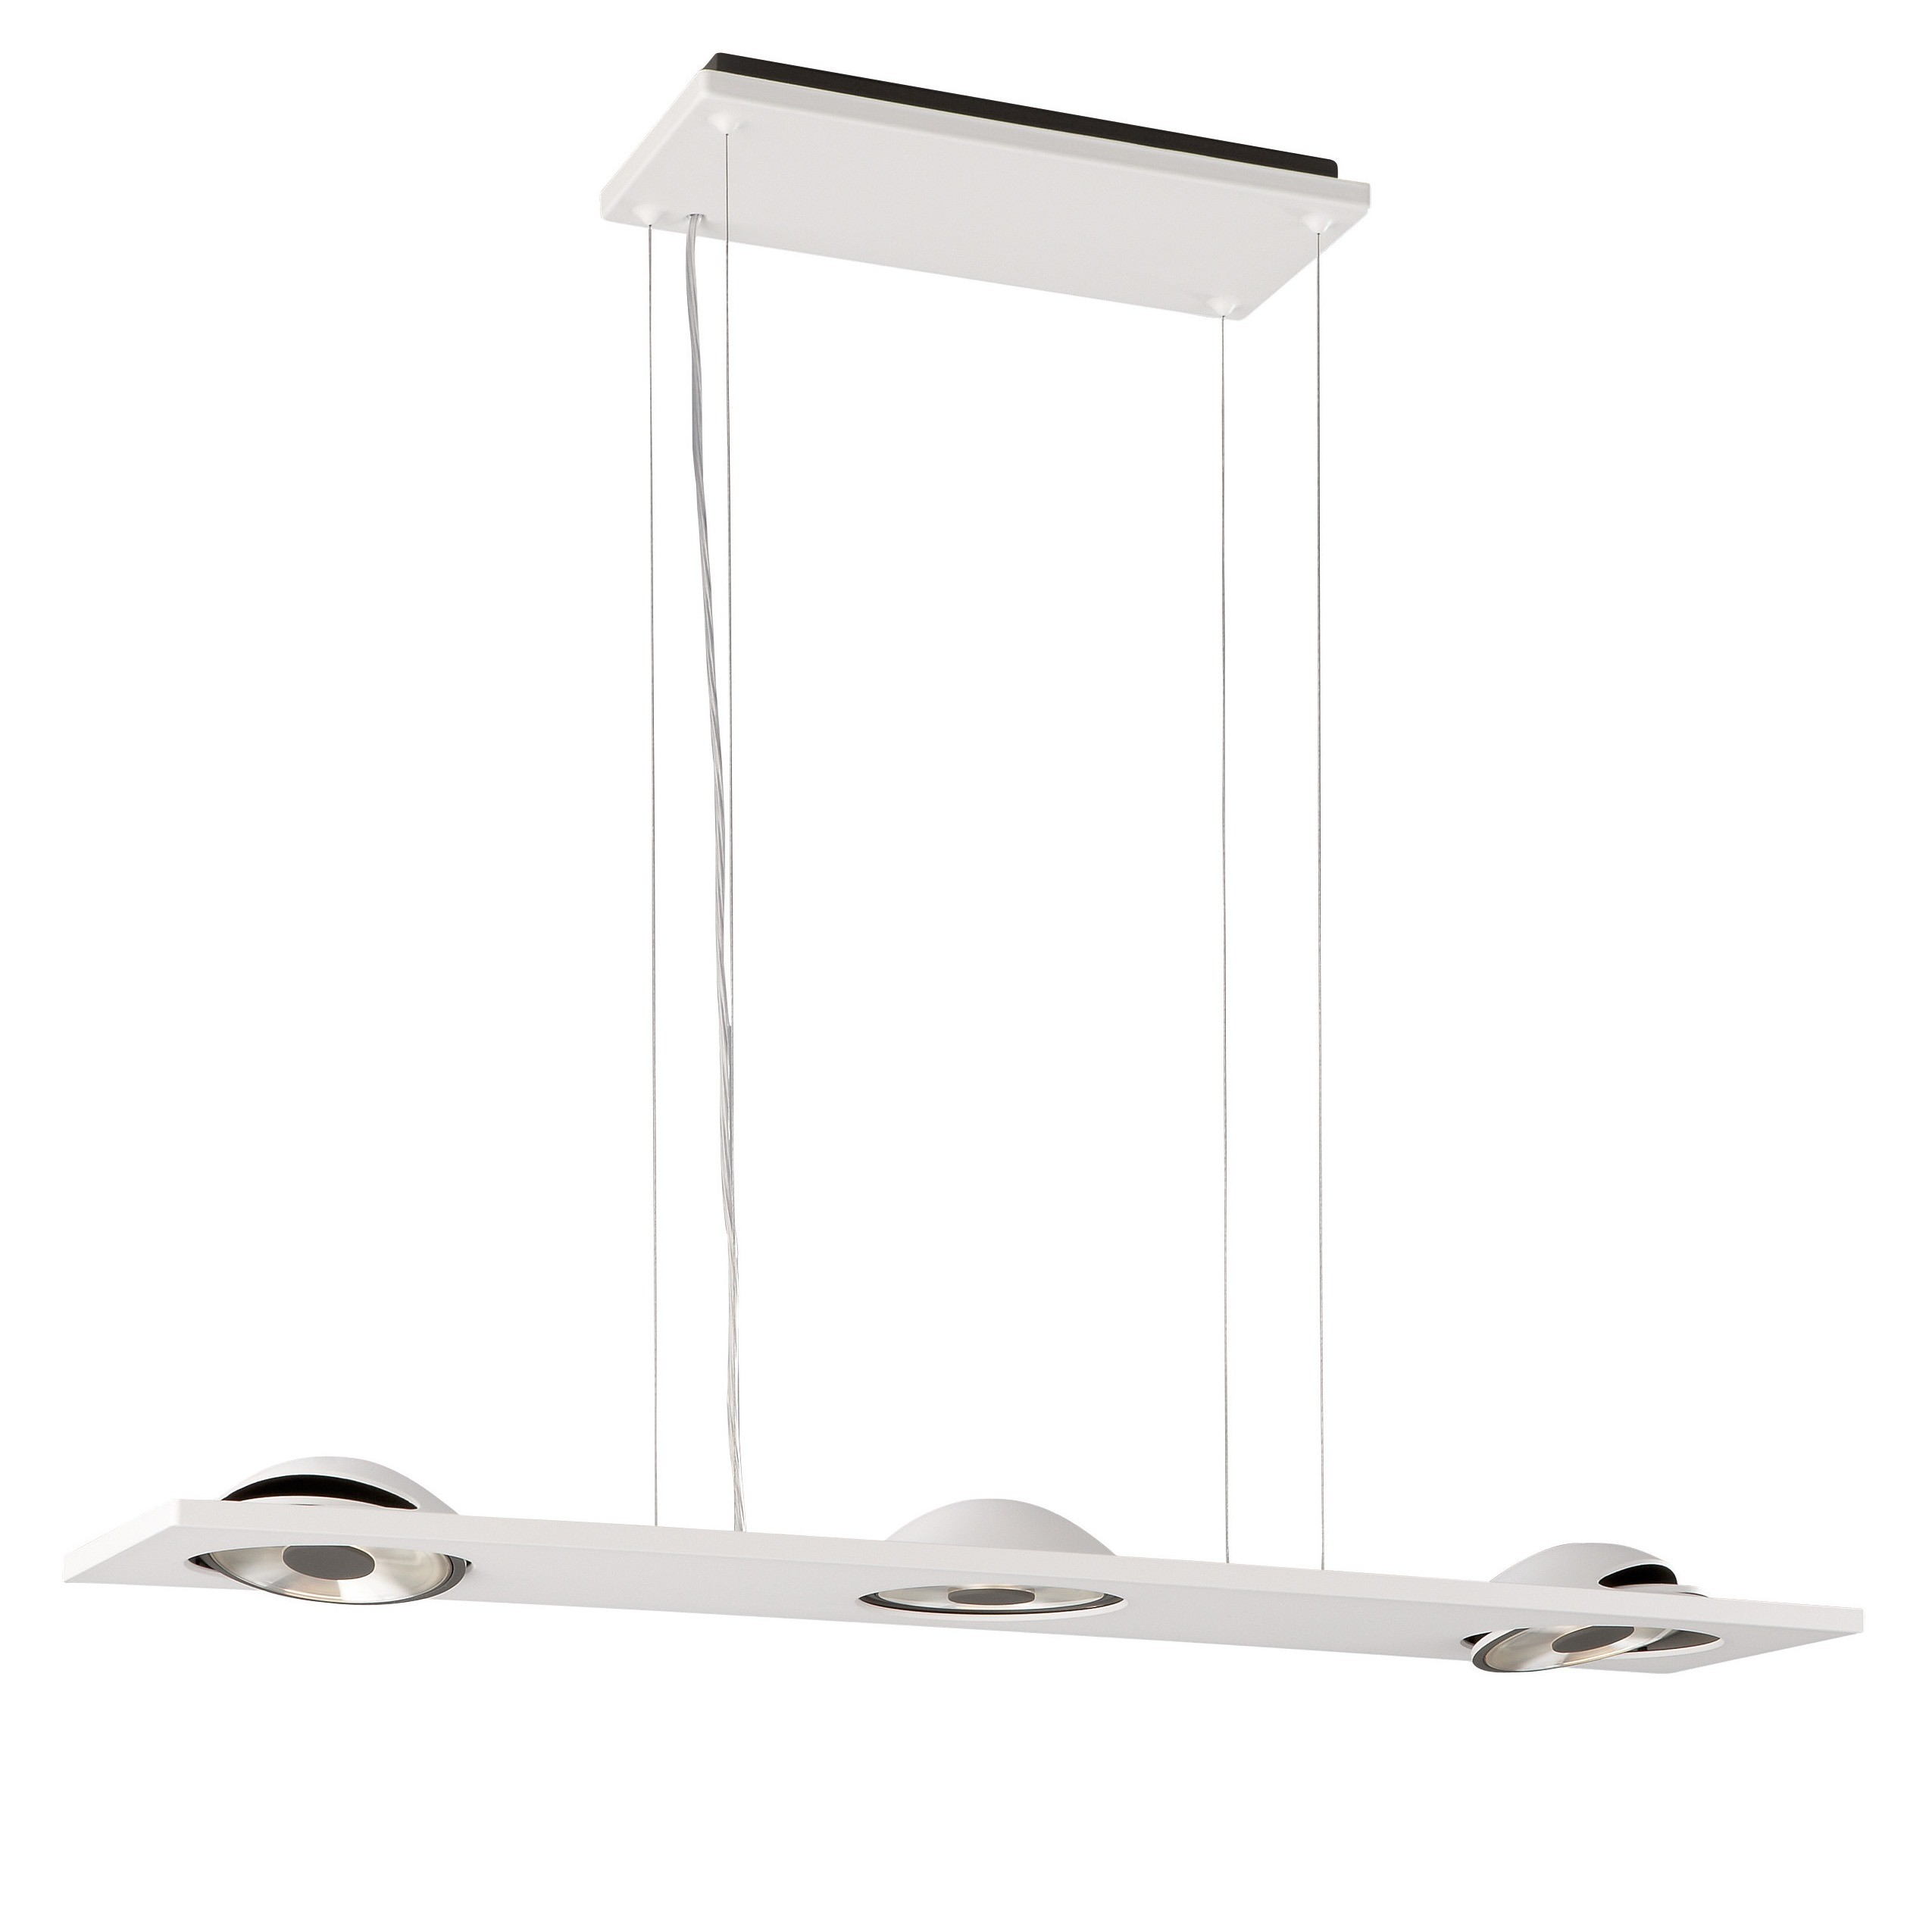 lirio trelome 3709531li hanglamp led. Black Bedroom Furniture Sets. Home Design Ideas